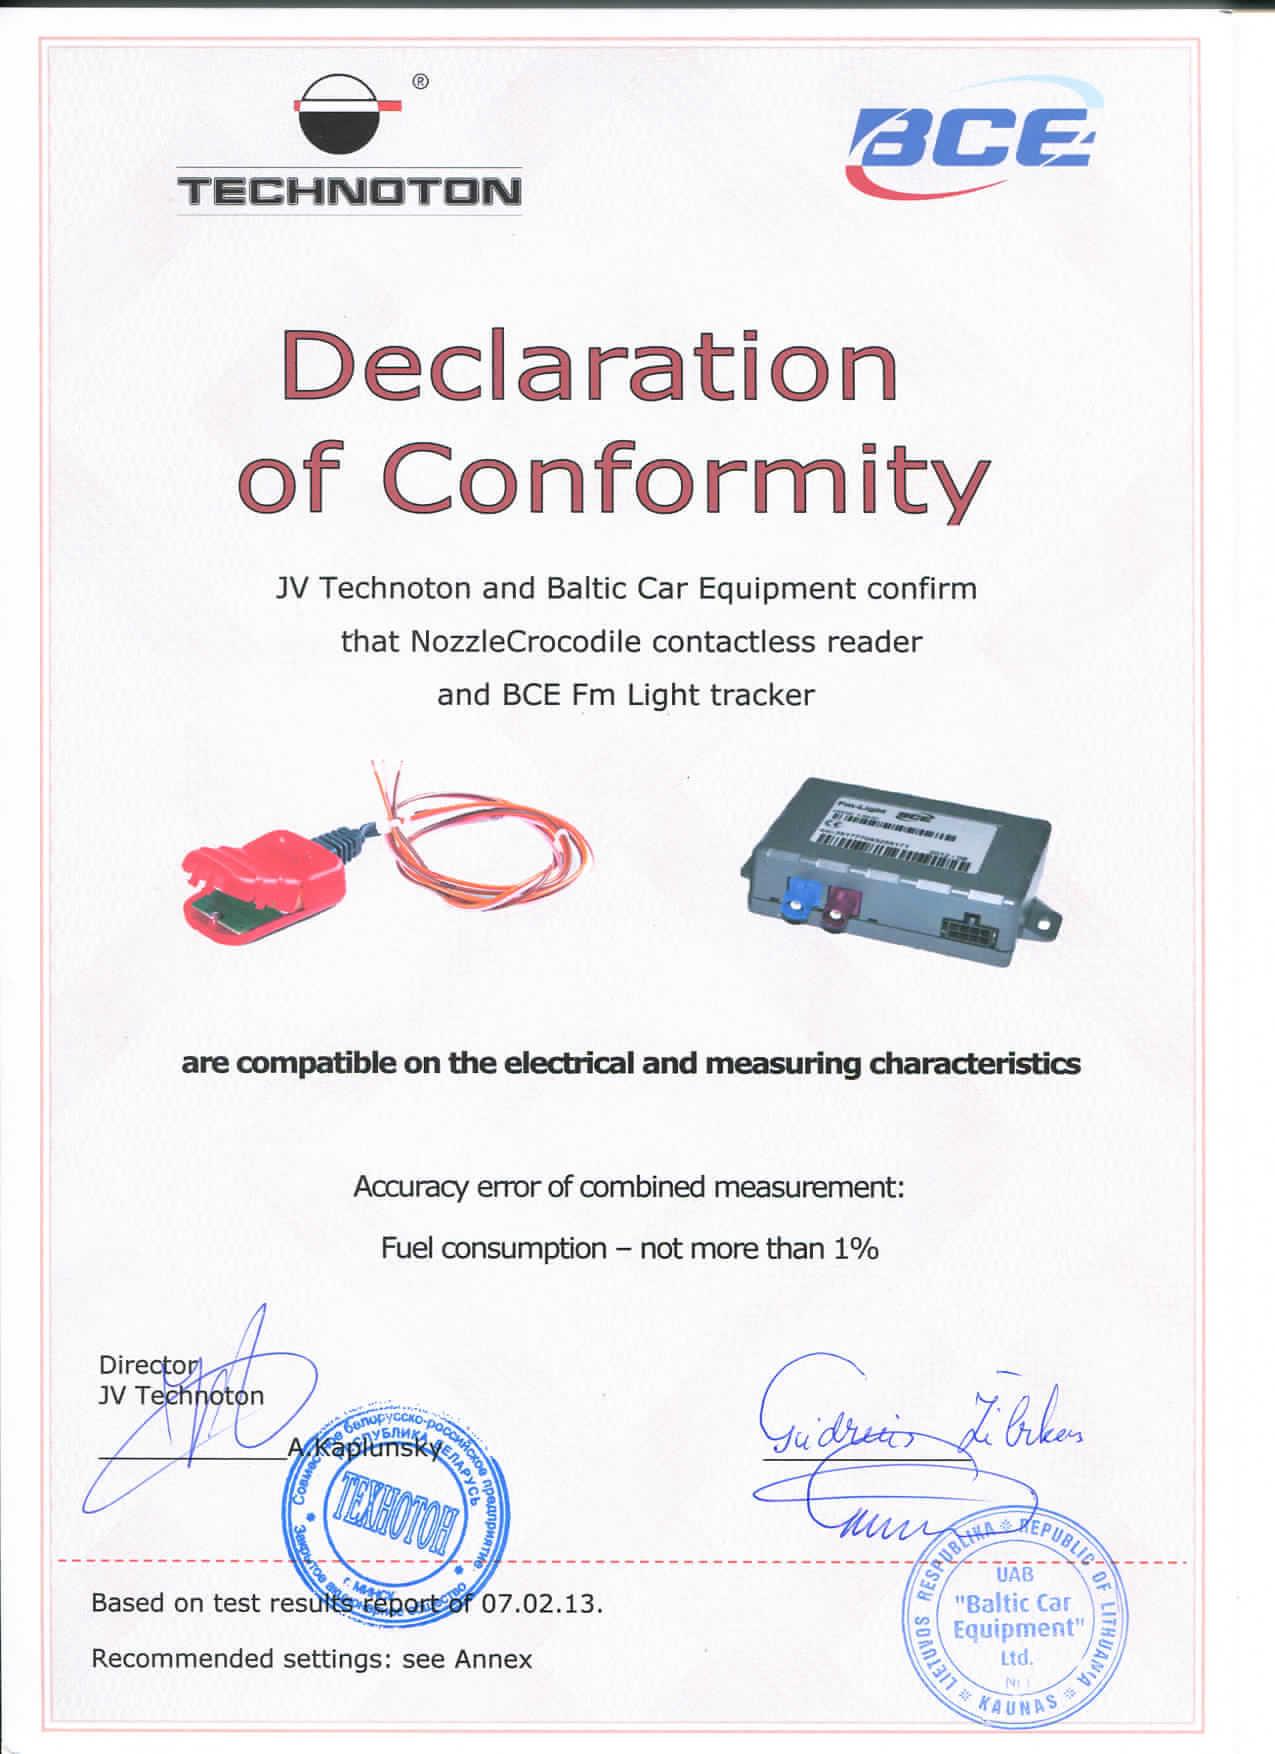 NozzleCrococdile and BCE-FM Light are compatible